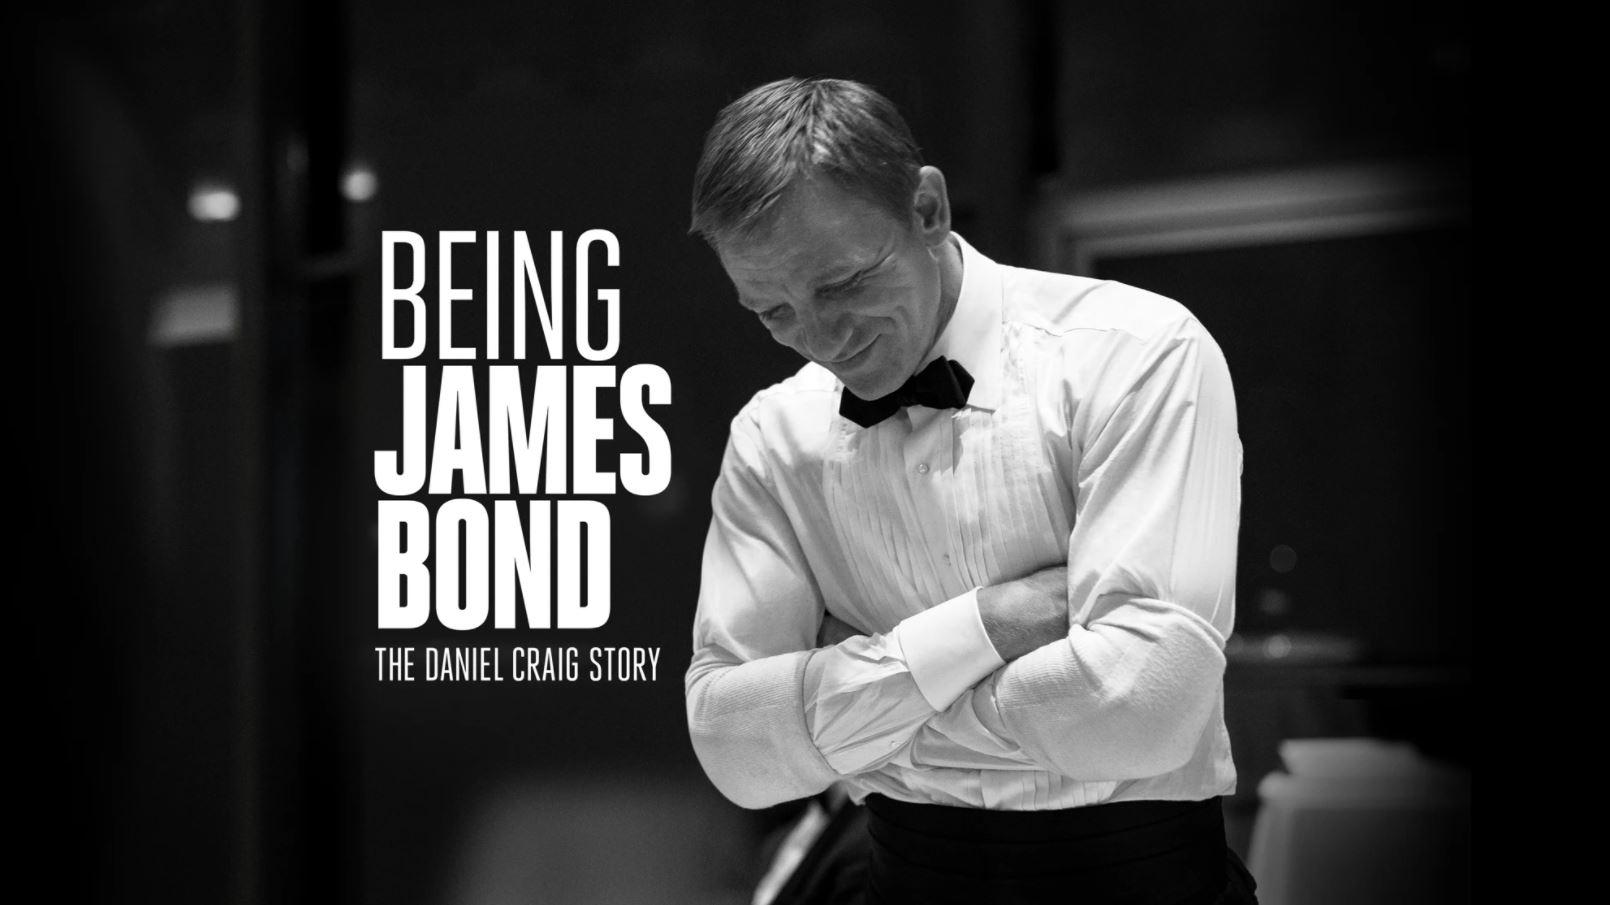 Essere James Bond – Su Apple TV il documentario su Daniel Craig